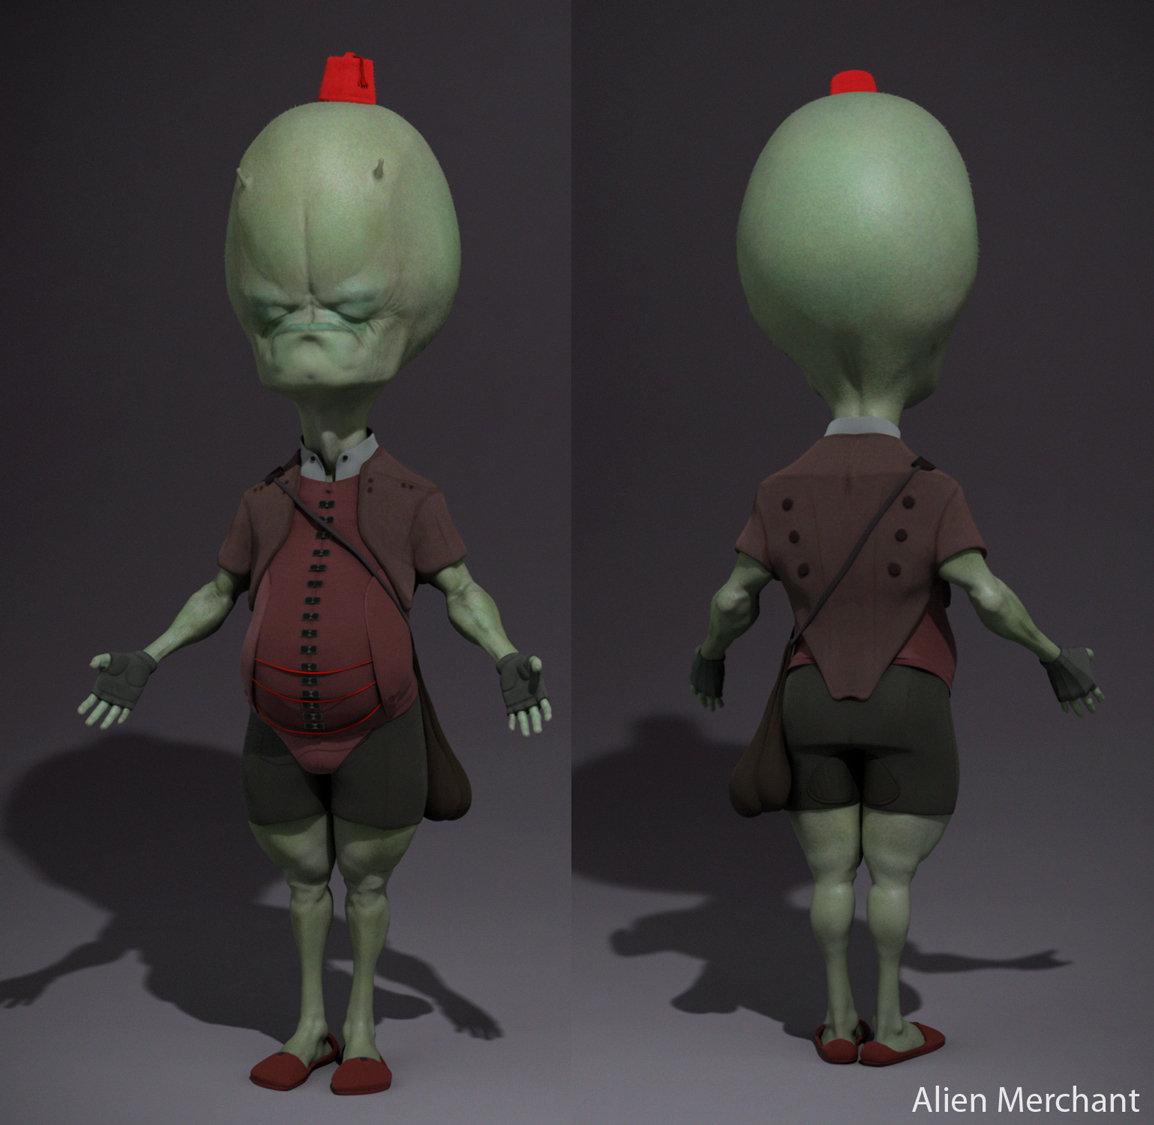 Matthew kean framedworld alien merchant